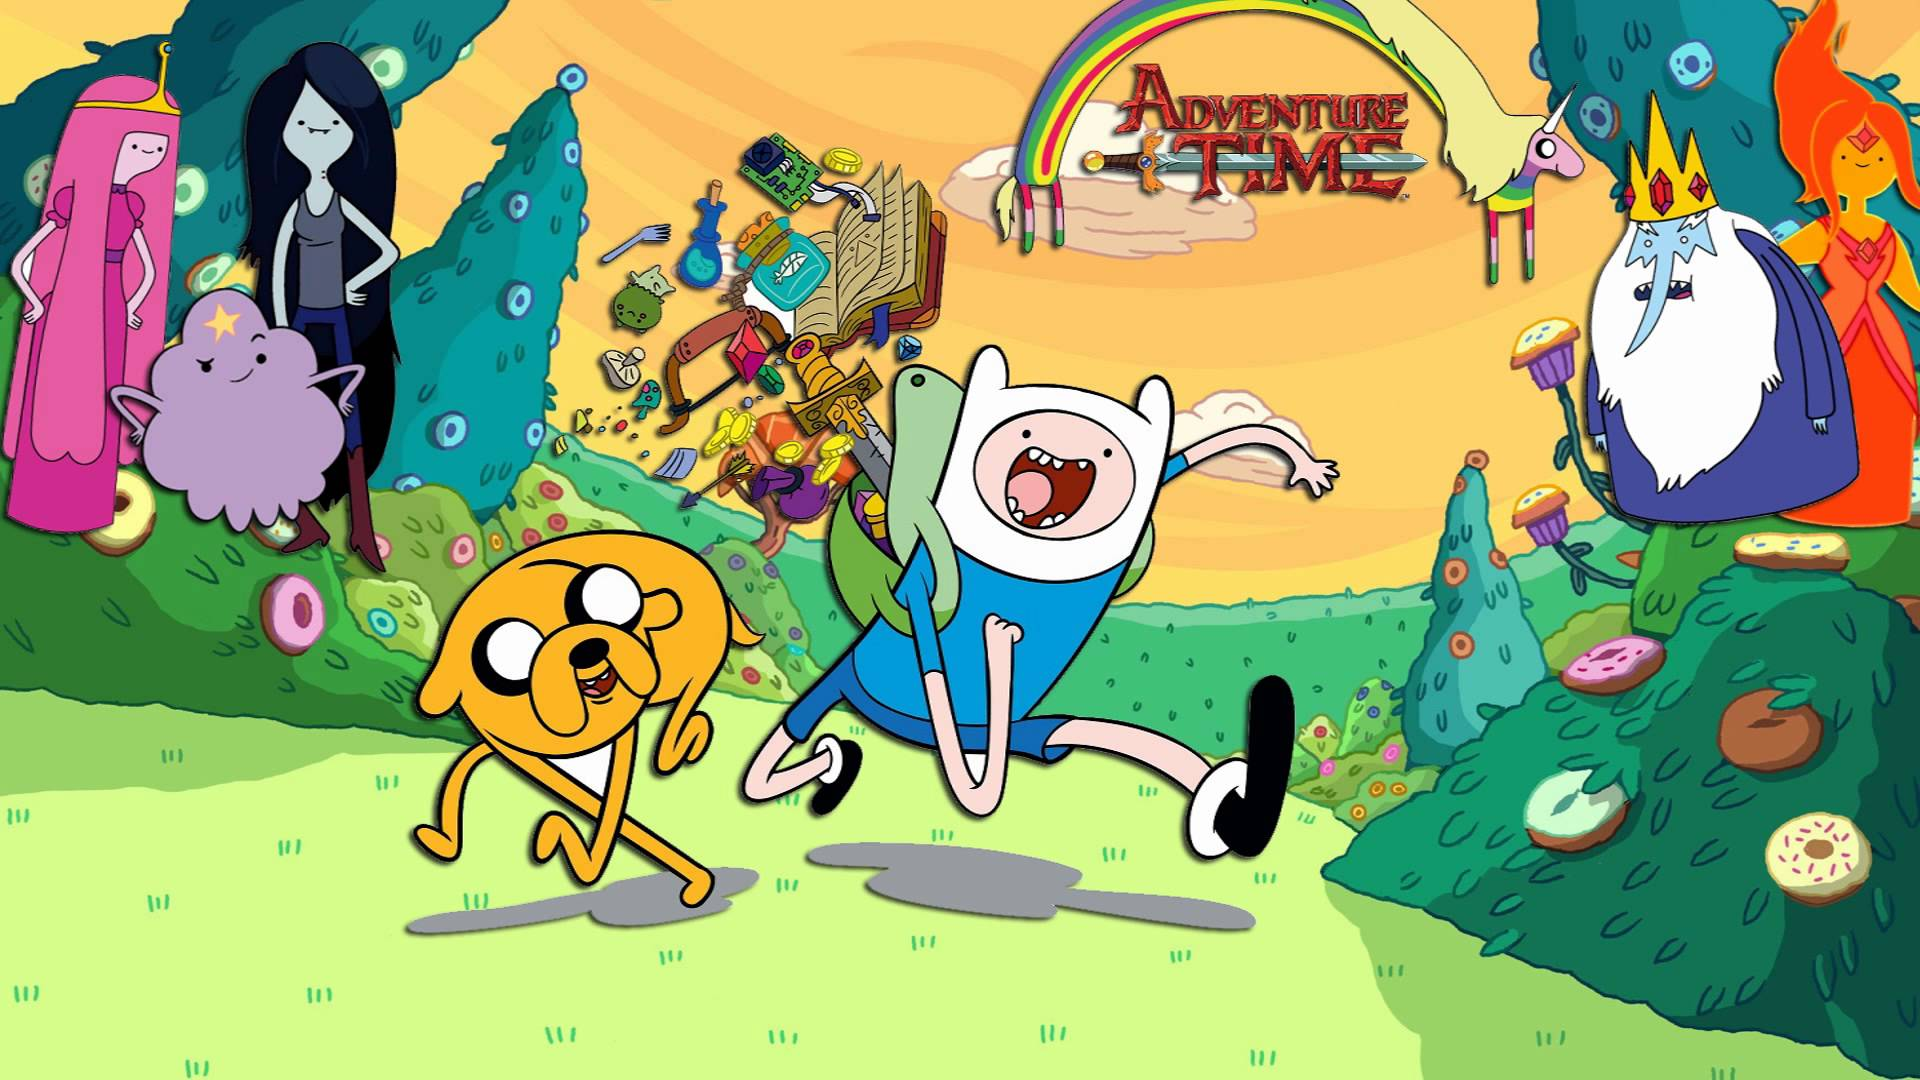 Jake Wallpaper Adventure Time